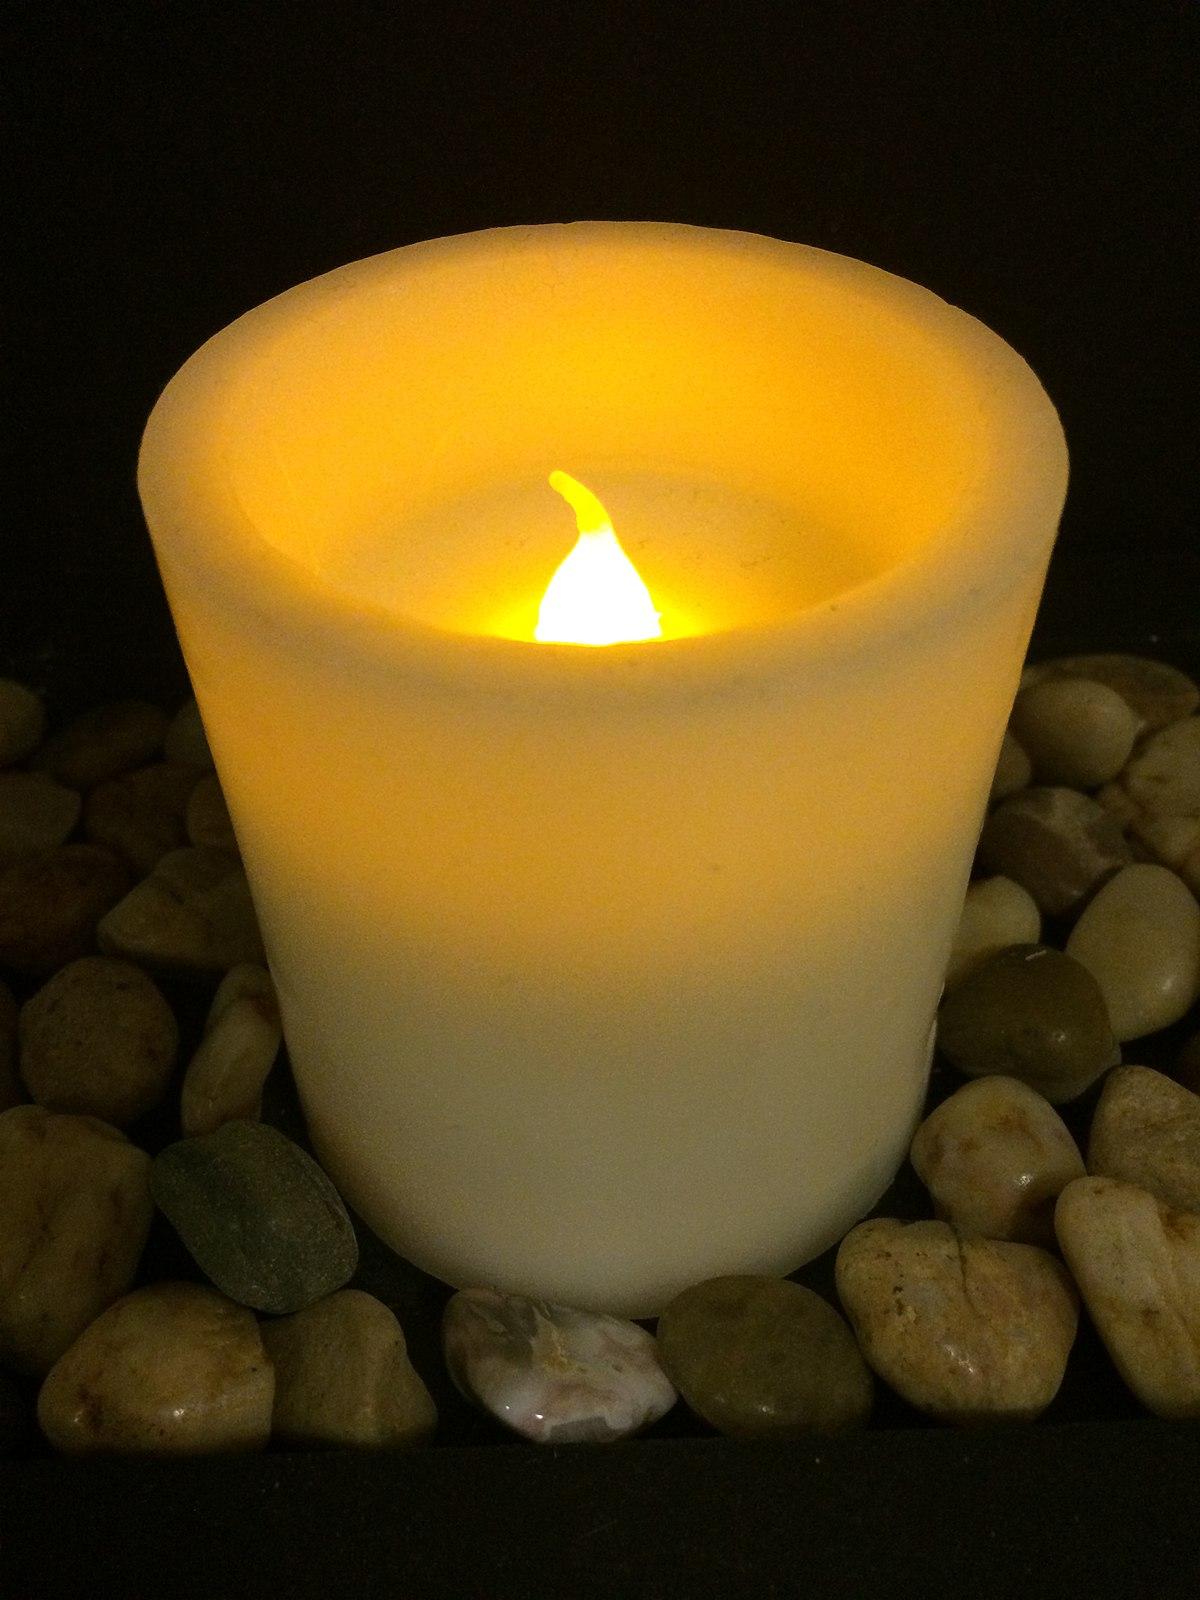 Flameless candle - Wikipedia